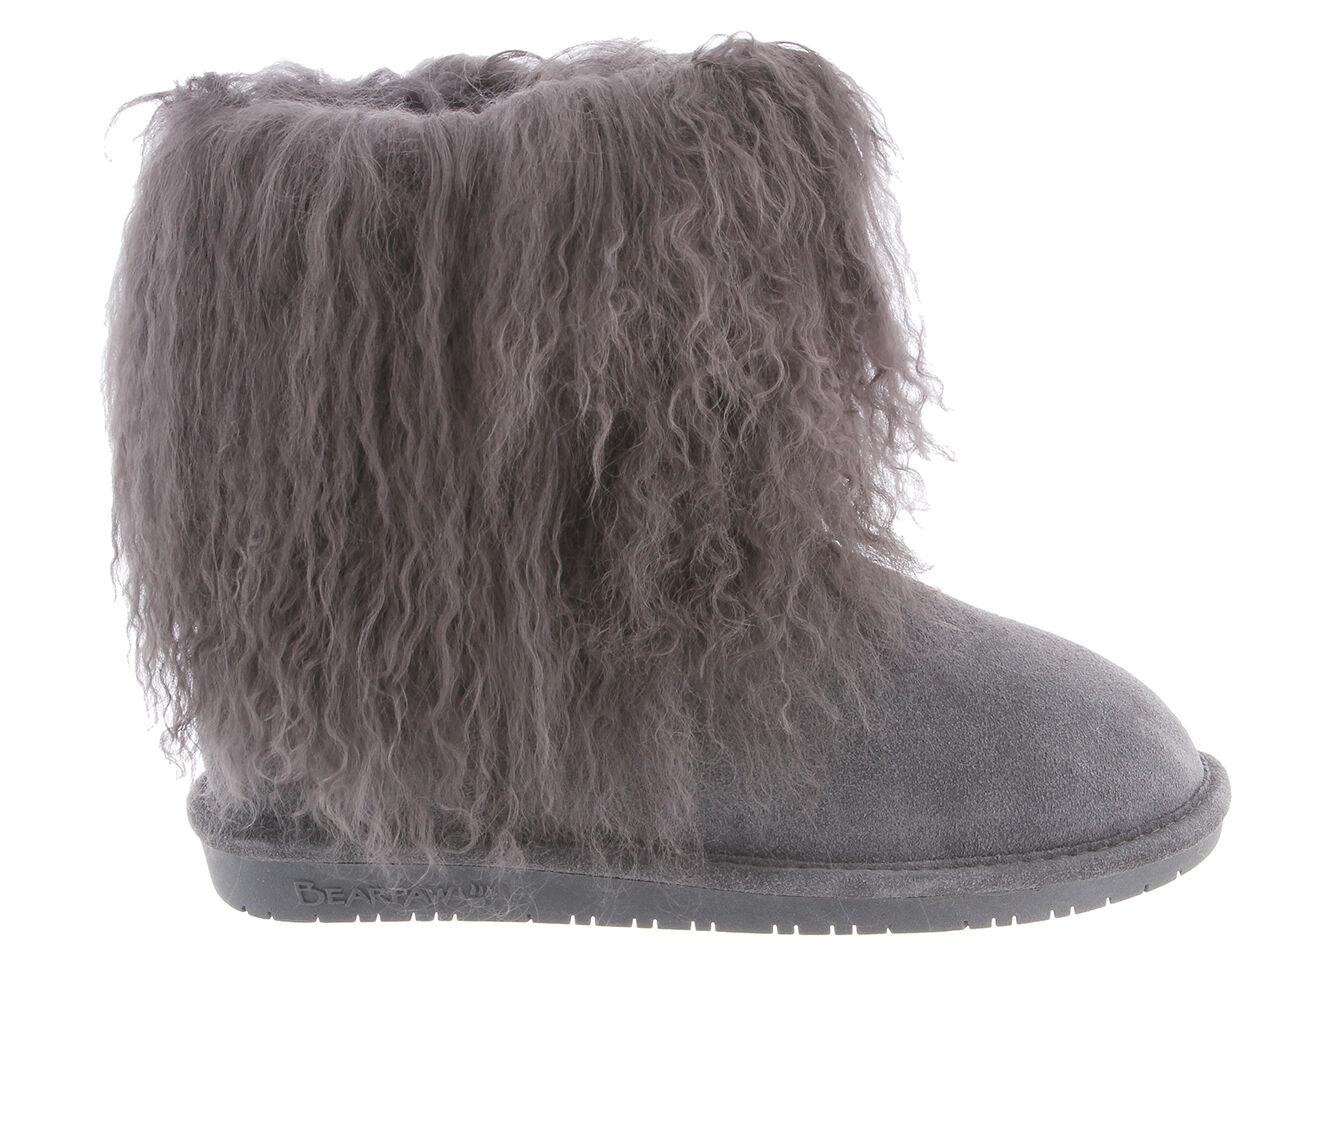 Women's Bearpaw Boo Boots Charcoal